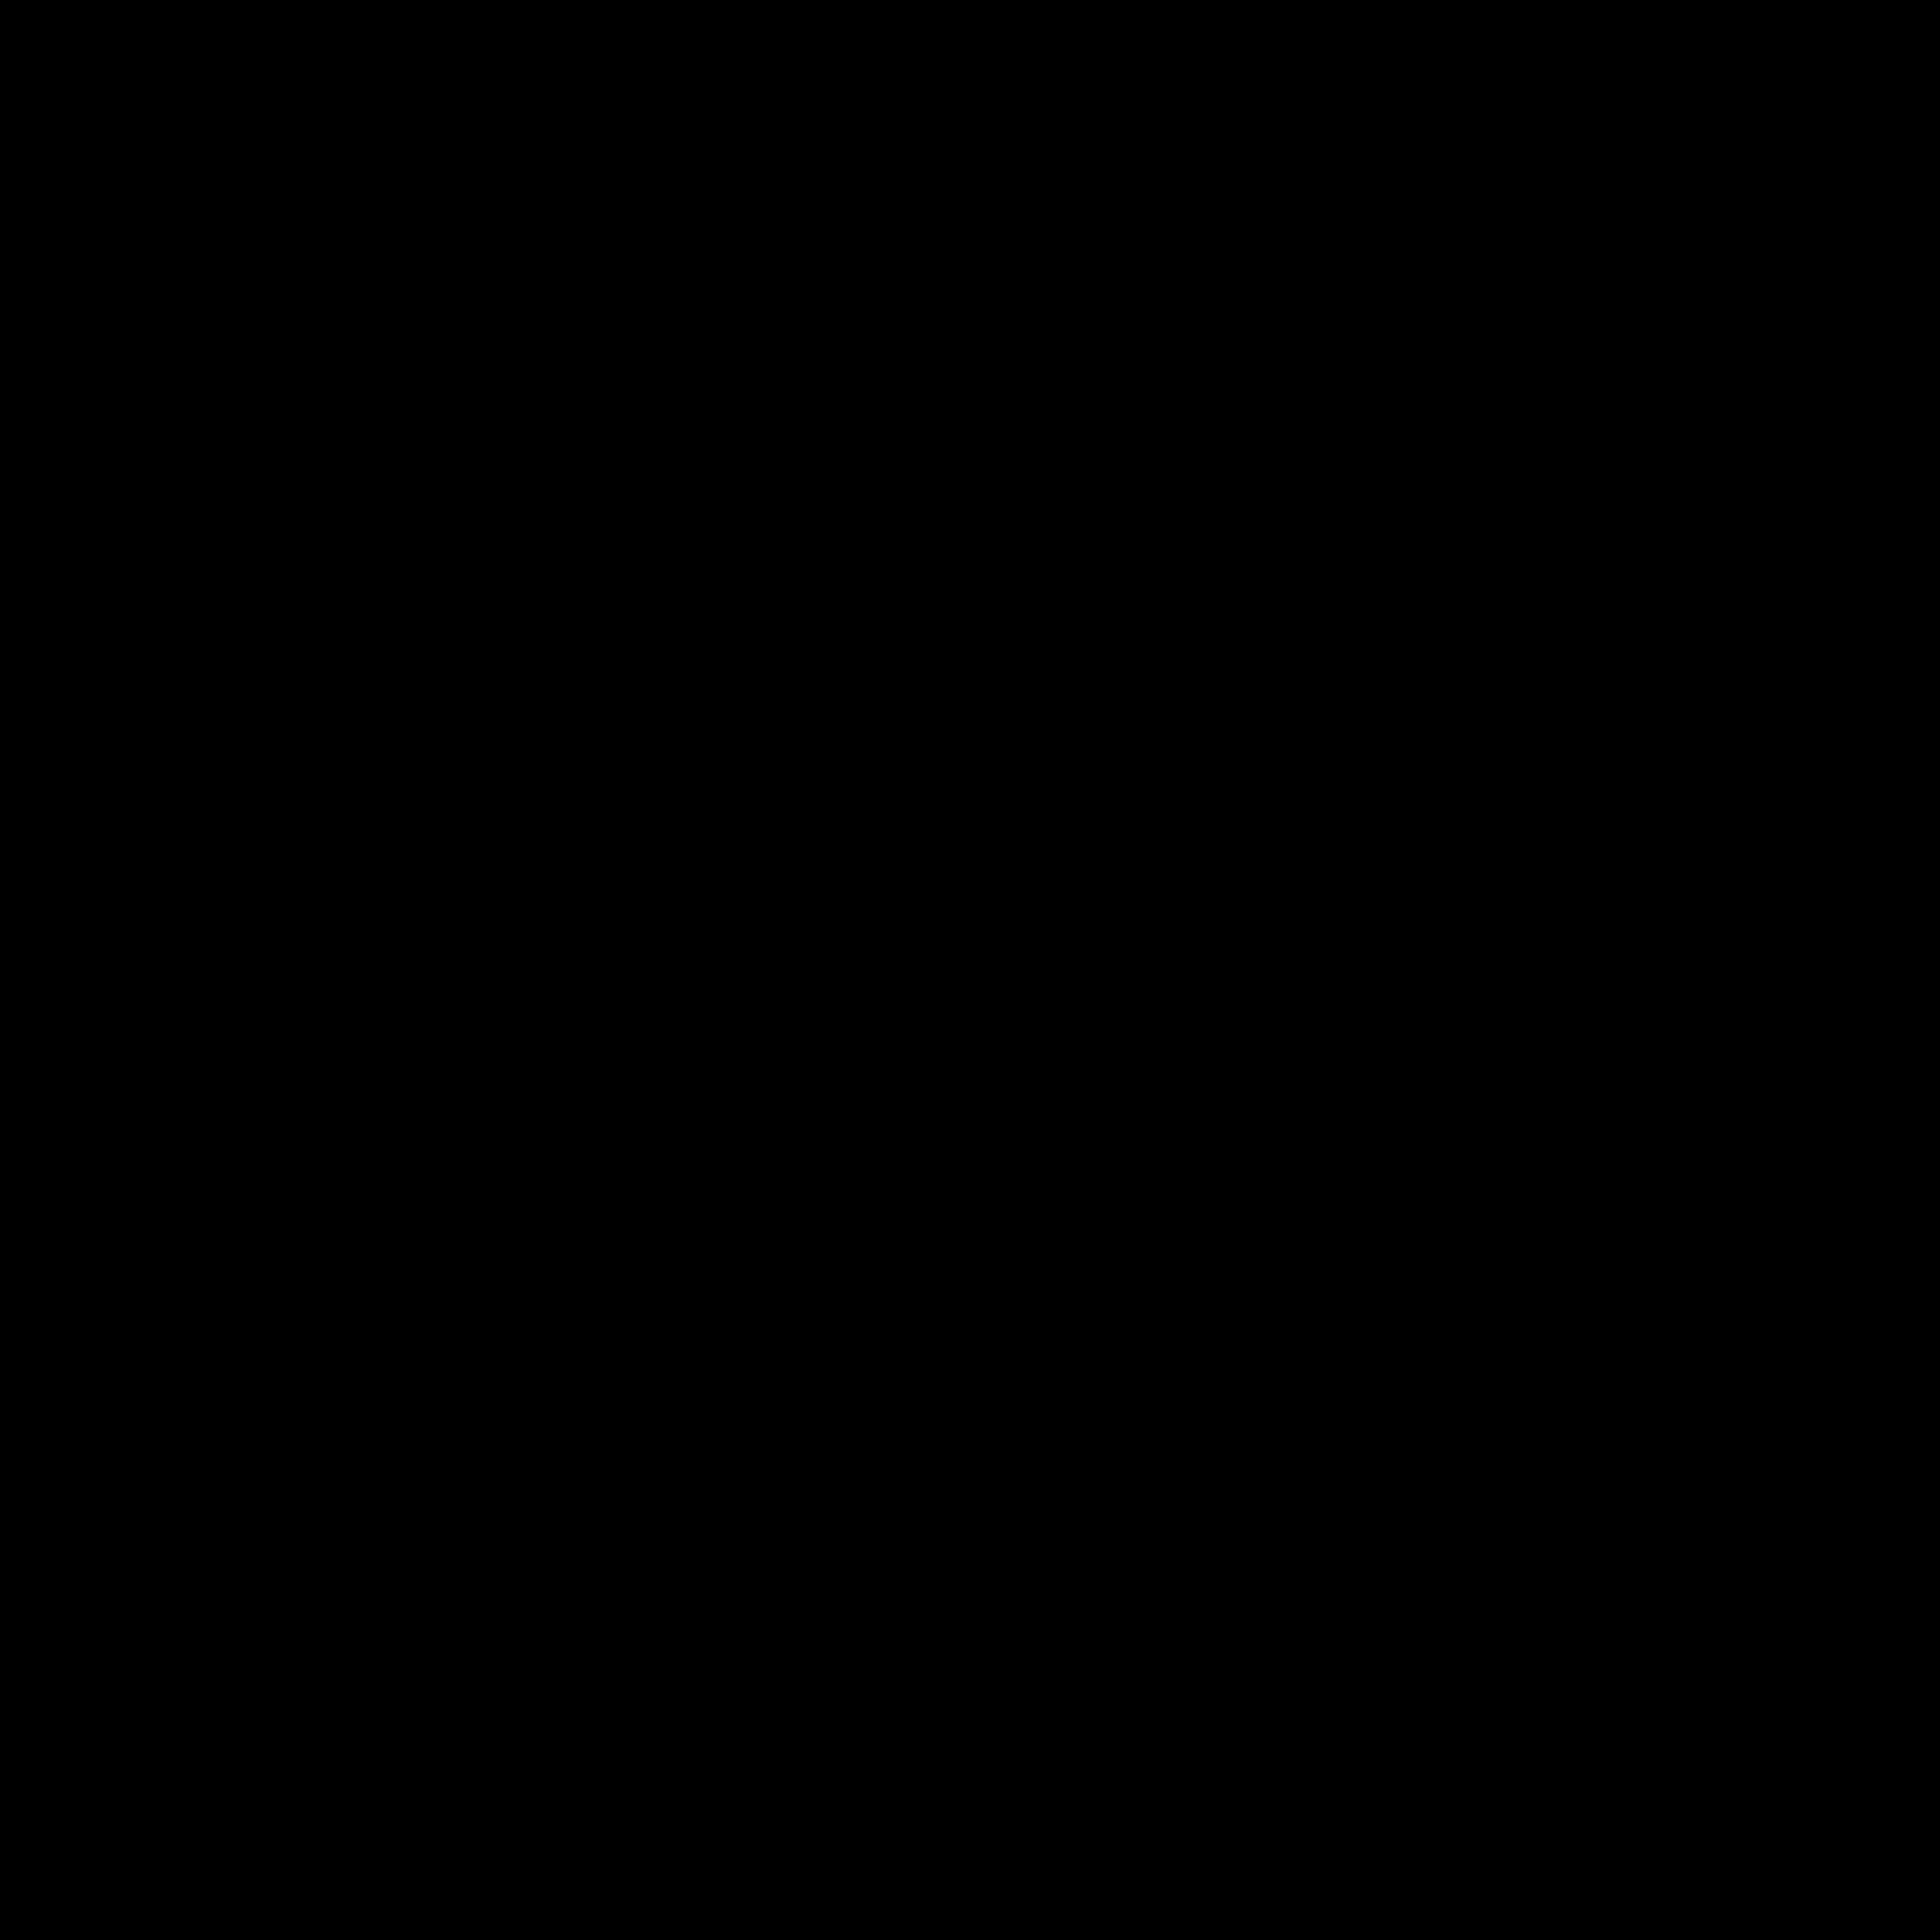 raymond-kao